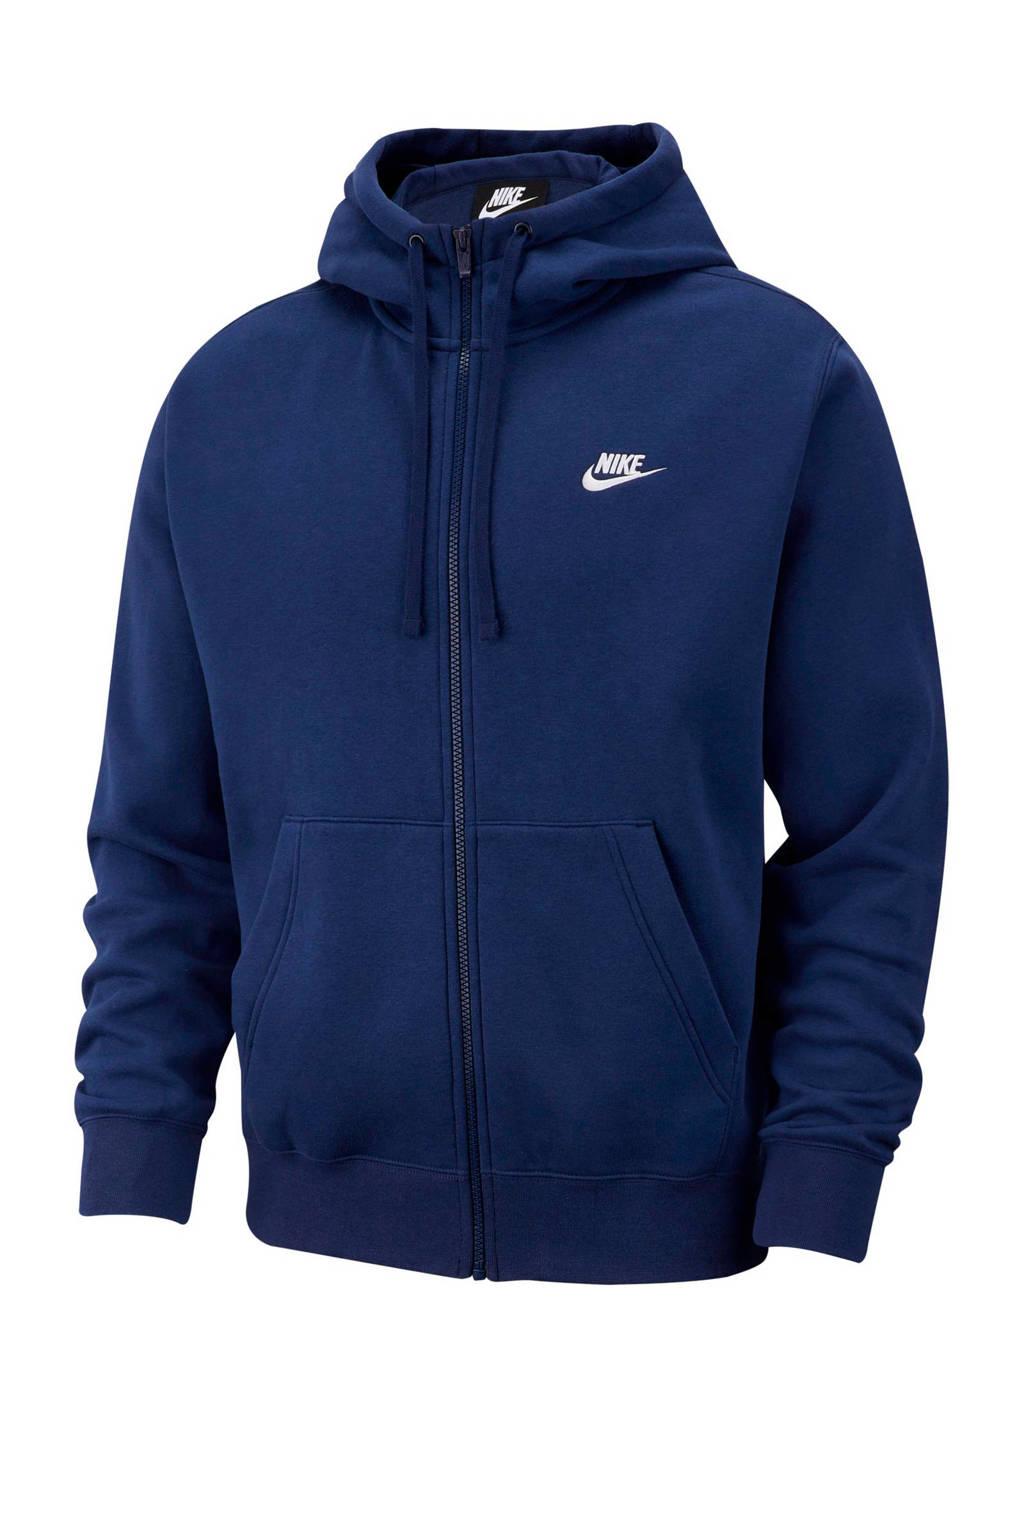 Marine vest Nike CU4455-410